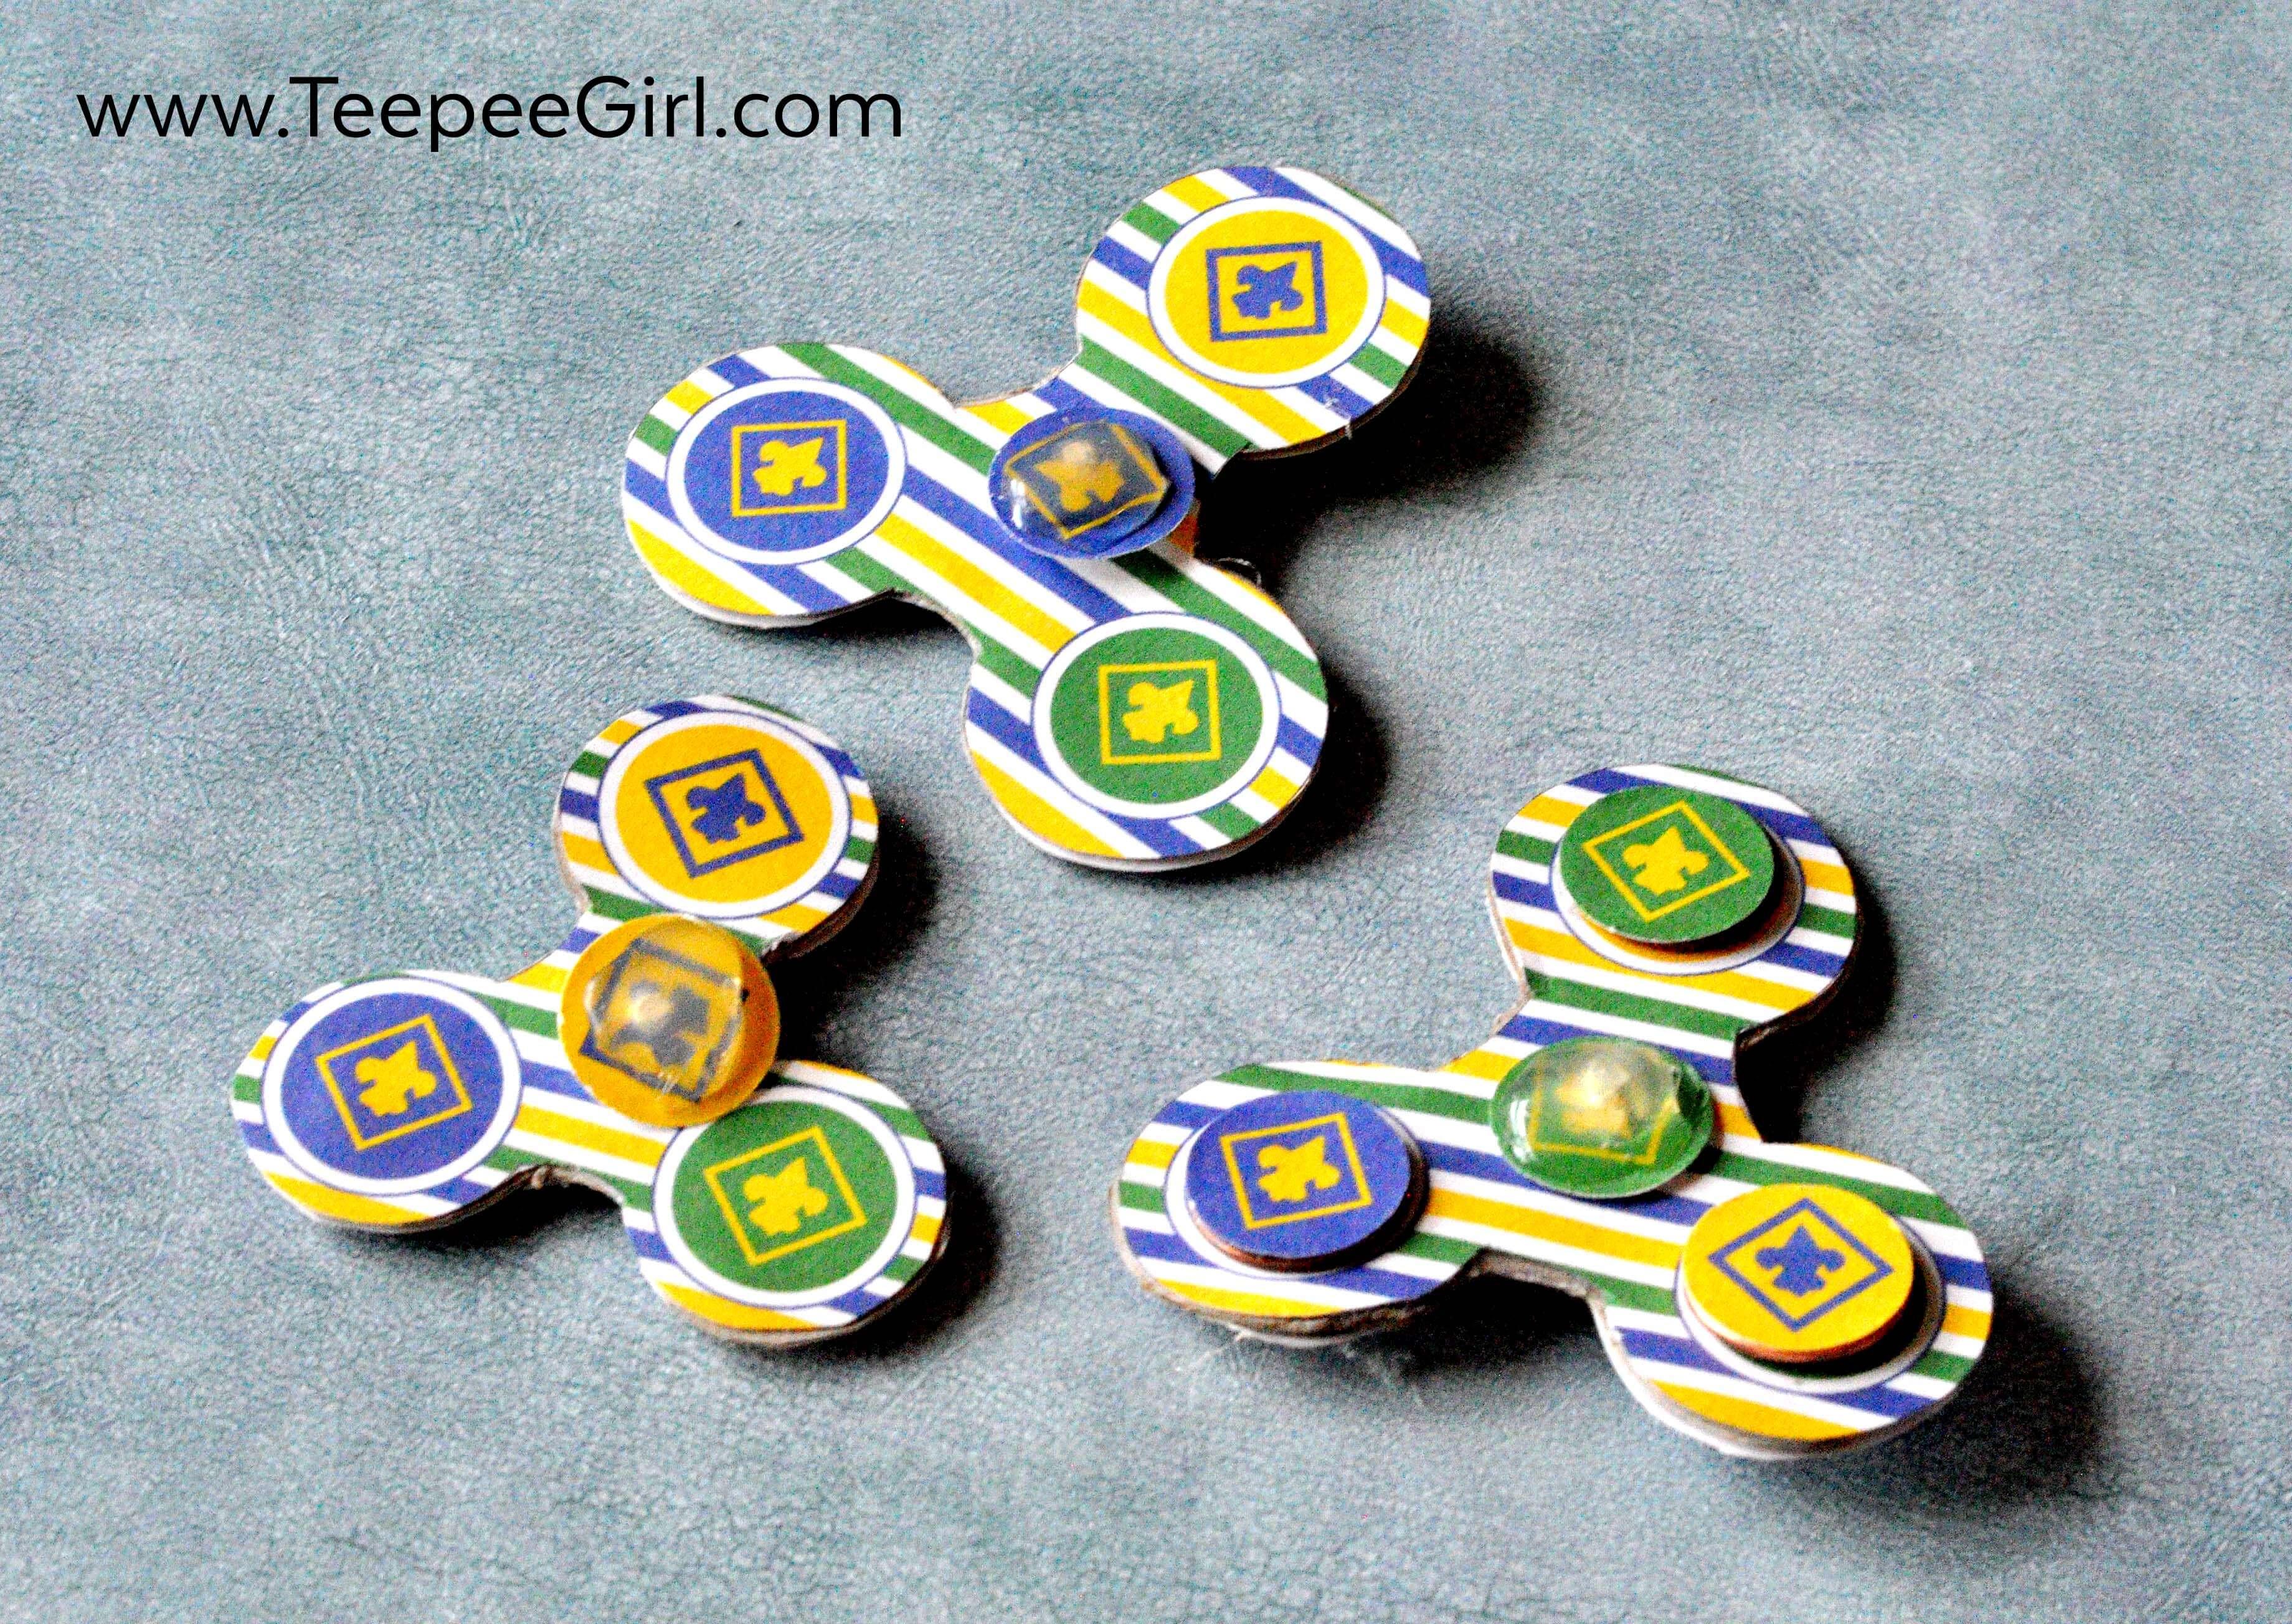 Cub Scout DIY Fidget Spinner - Teepee Girl